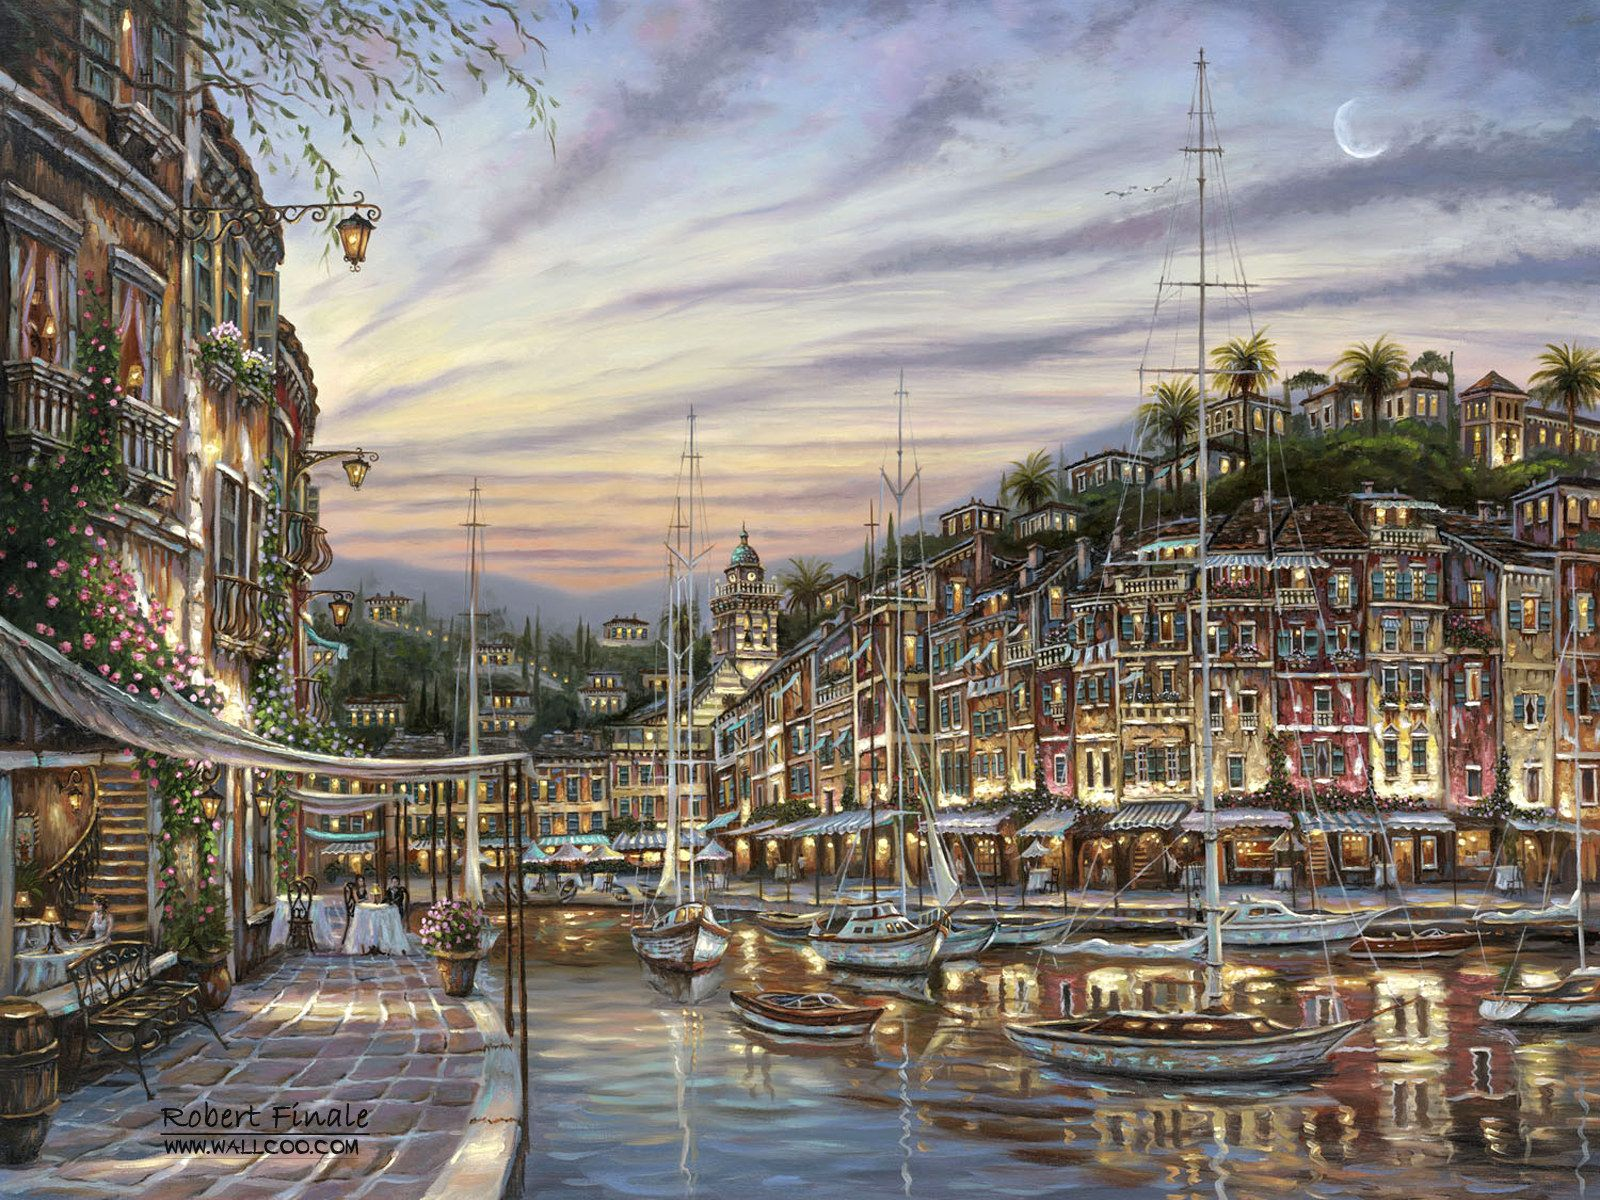 Robert_Finale_art_paintings_PortofinoDawn.jpg (1600×1200)